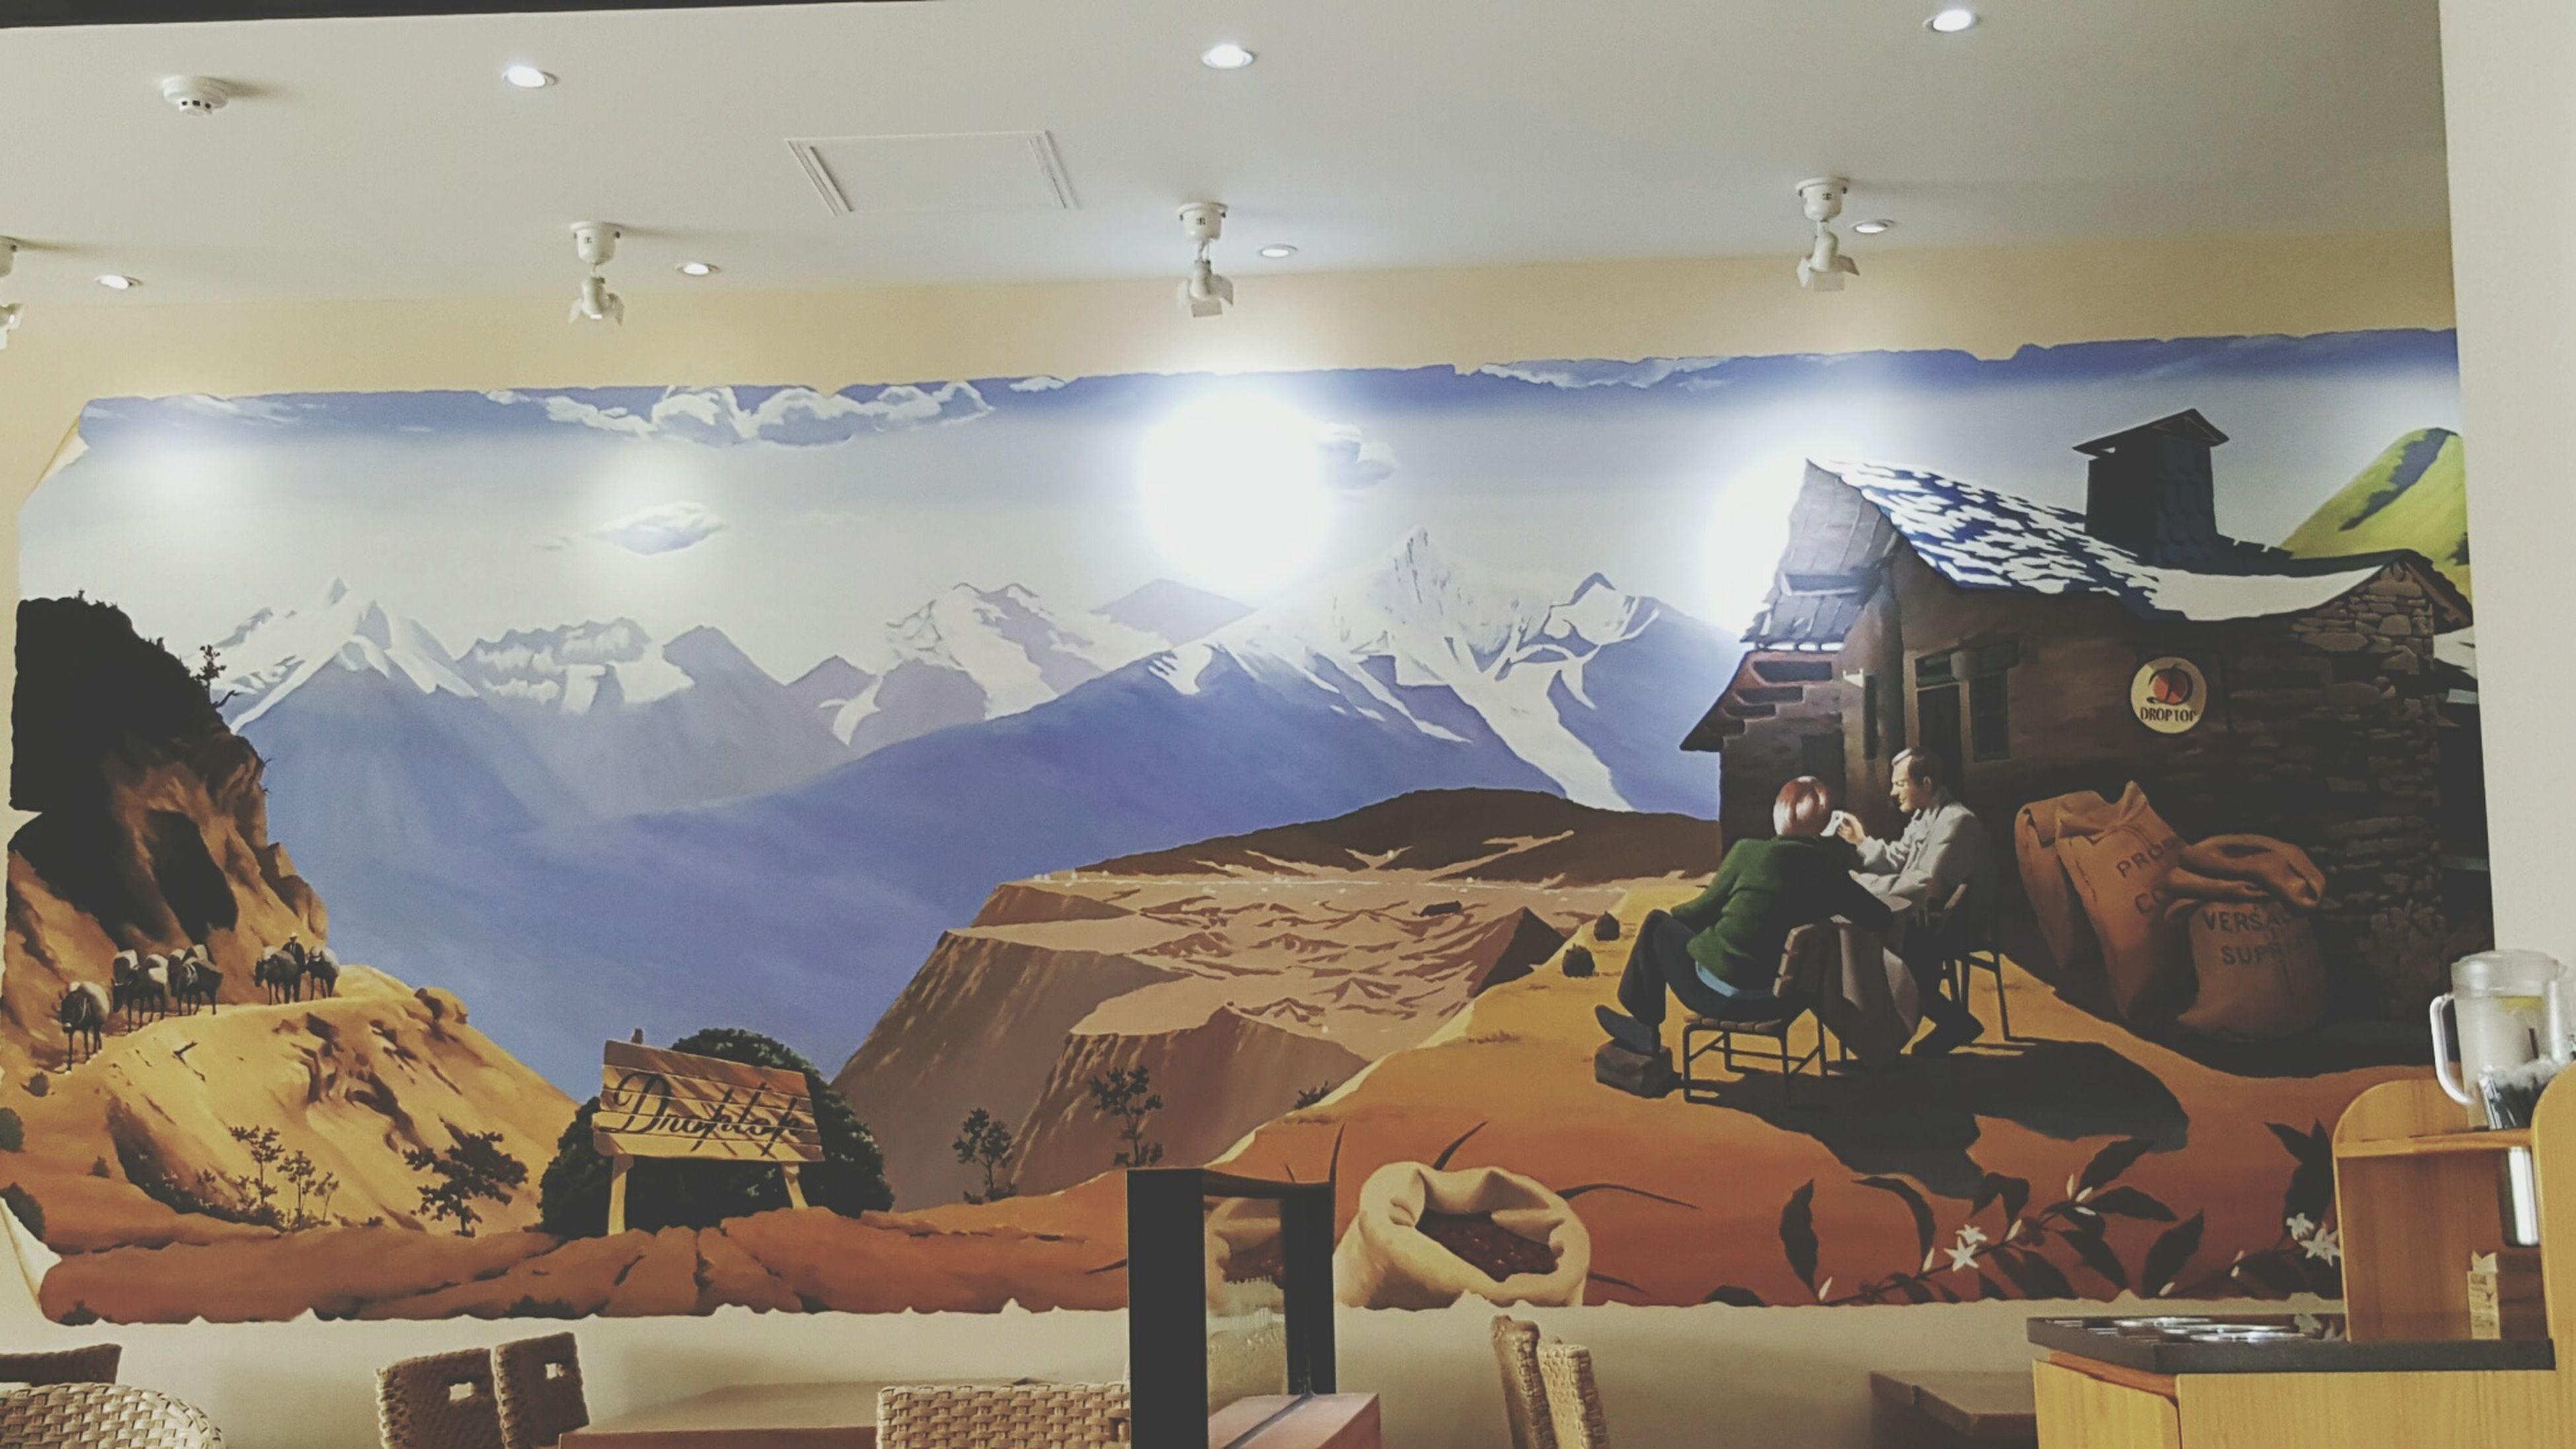 mountain, sunbeam, mountain range, modern, creativity, tranquil scene, tranquility, no people